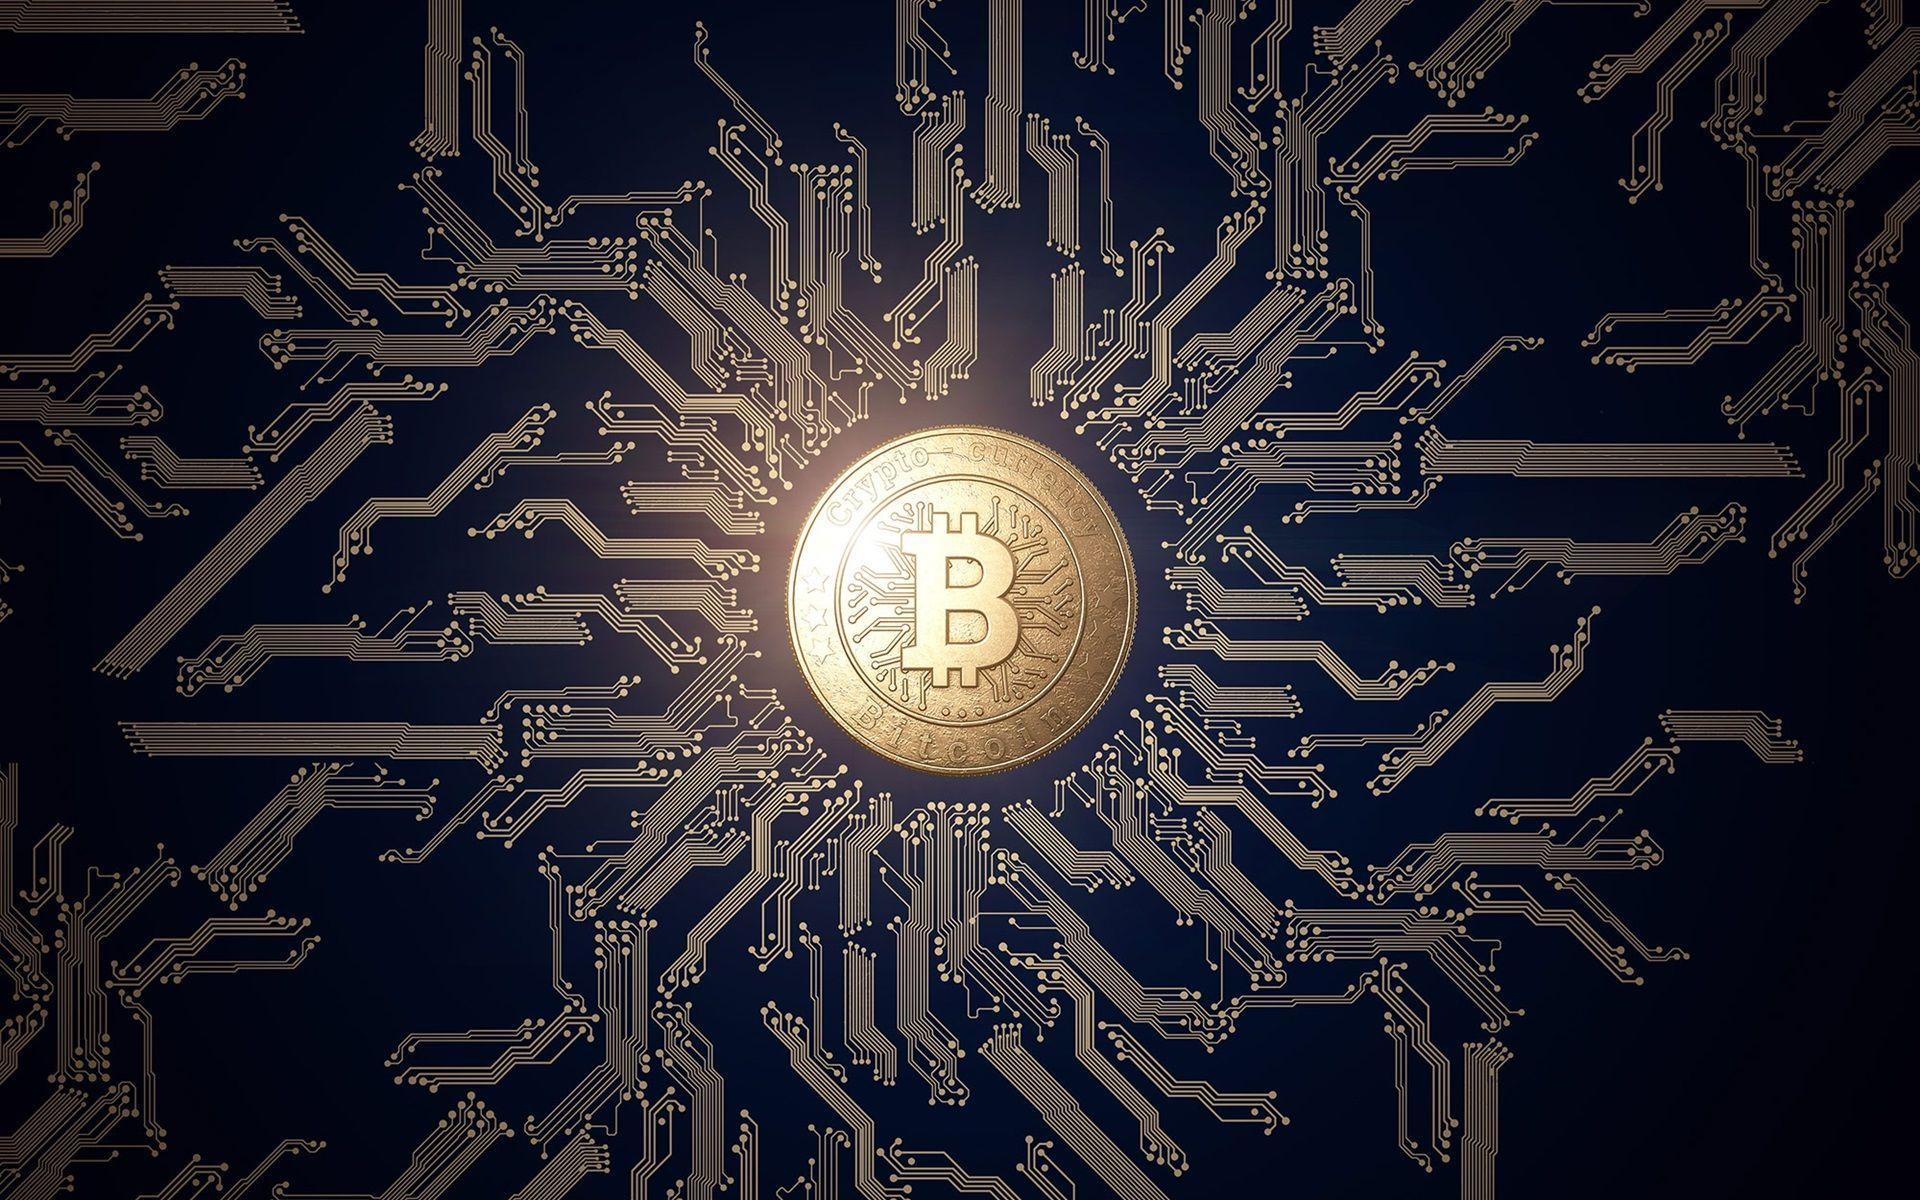 Bitcoin Wallpapers - Top Free Bitcoin Backgrounds - WallpaperAccess